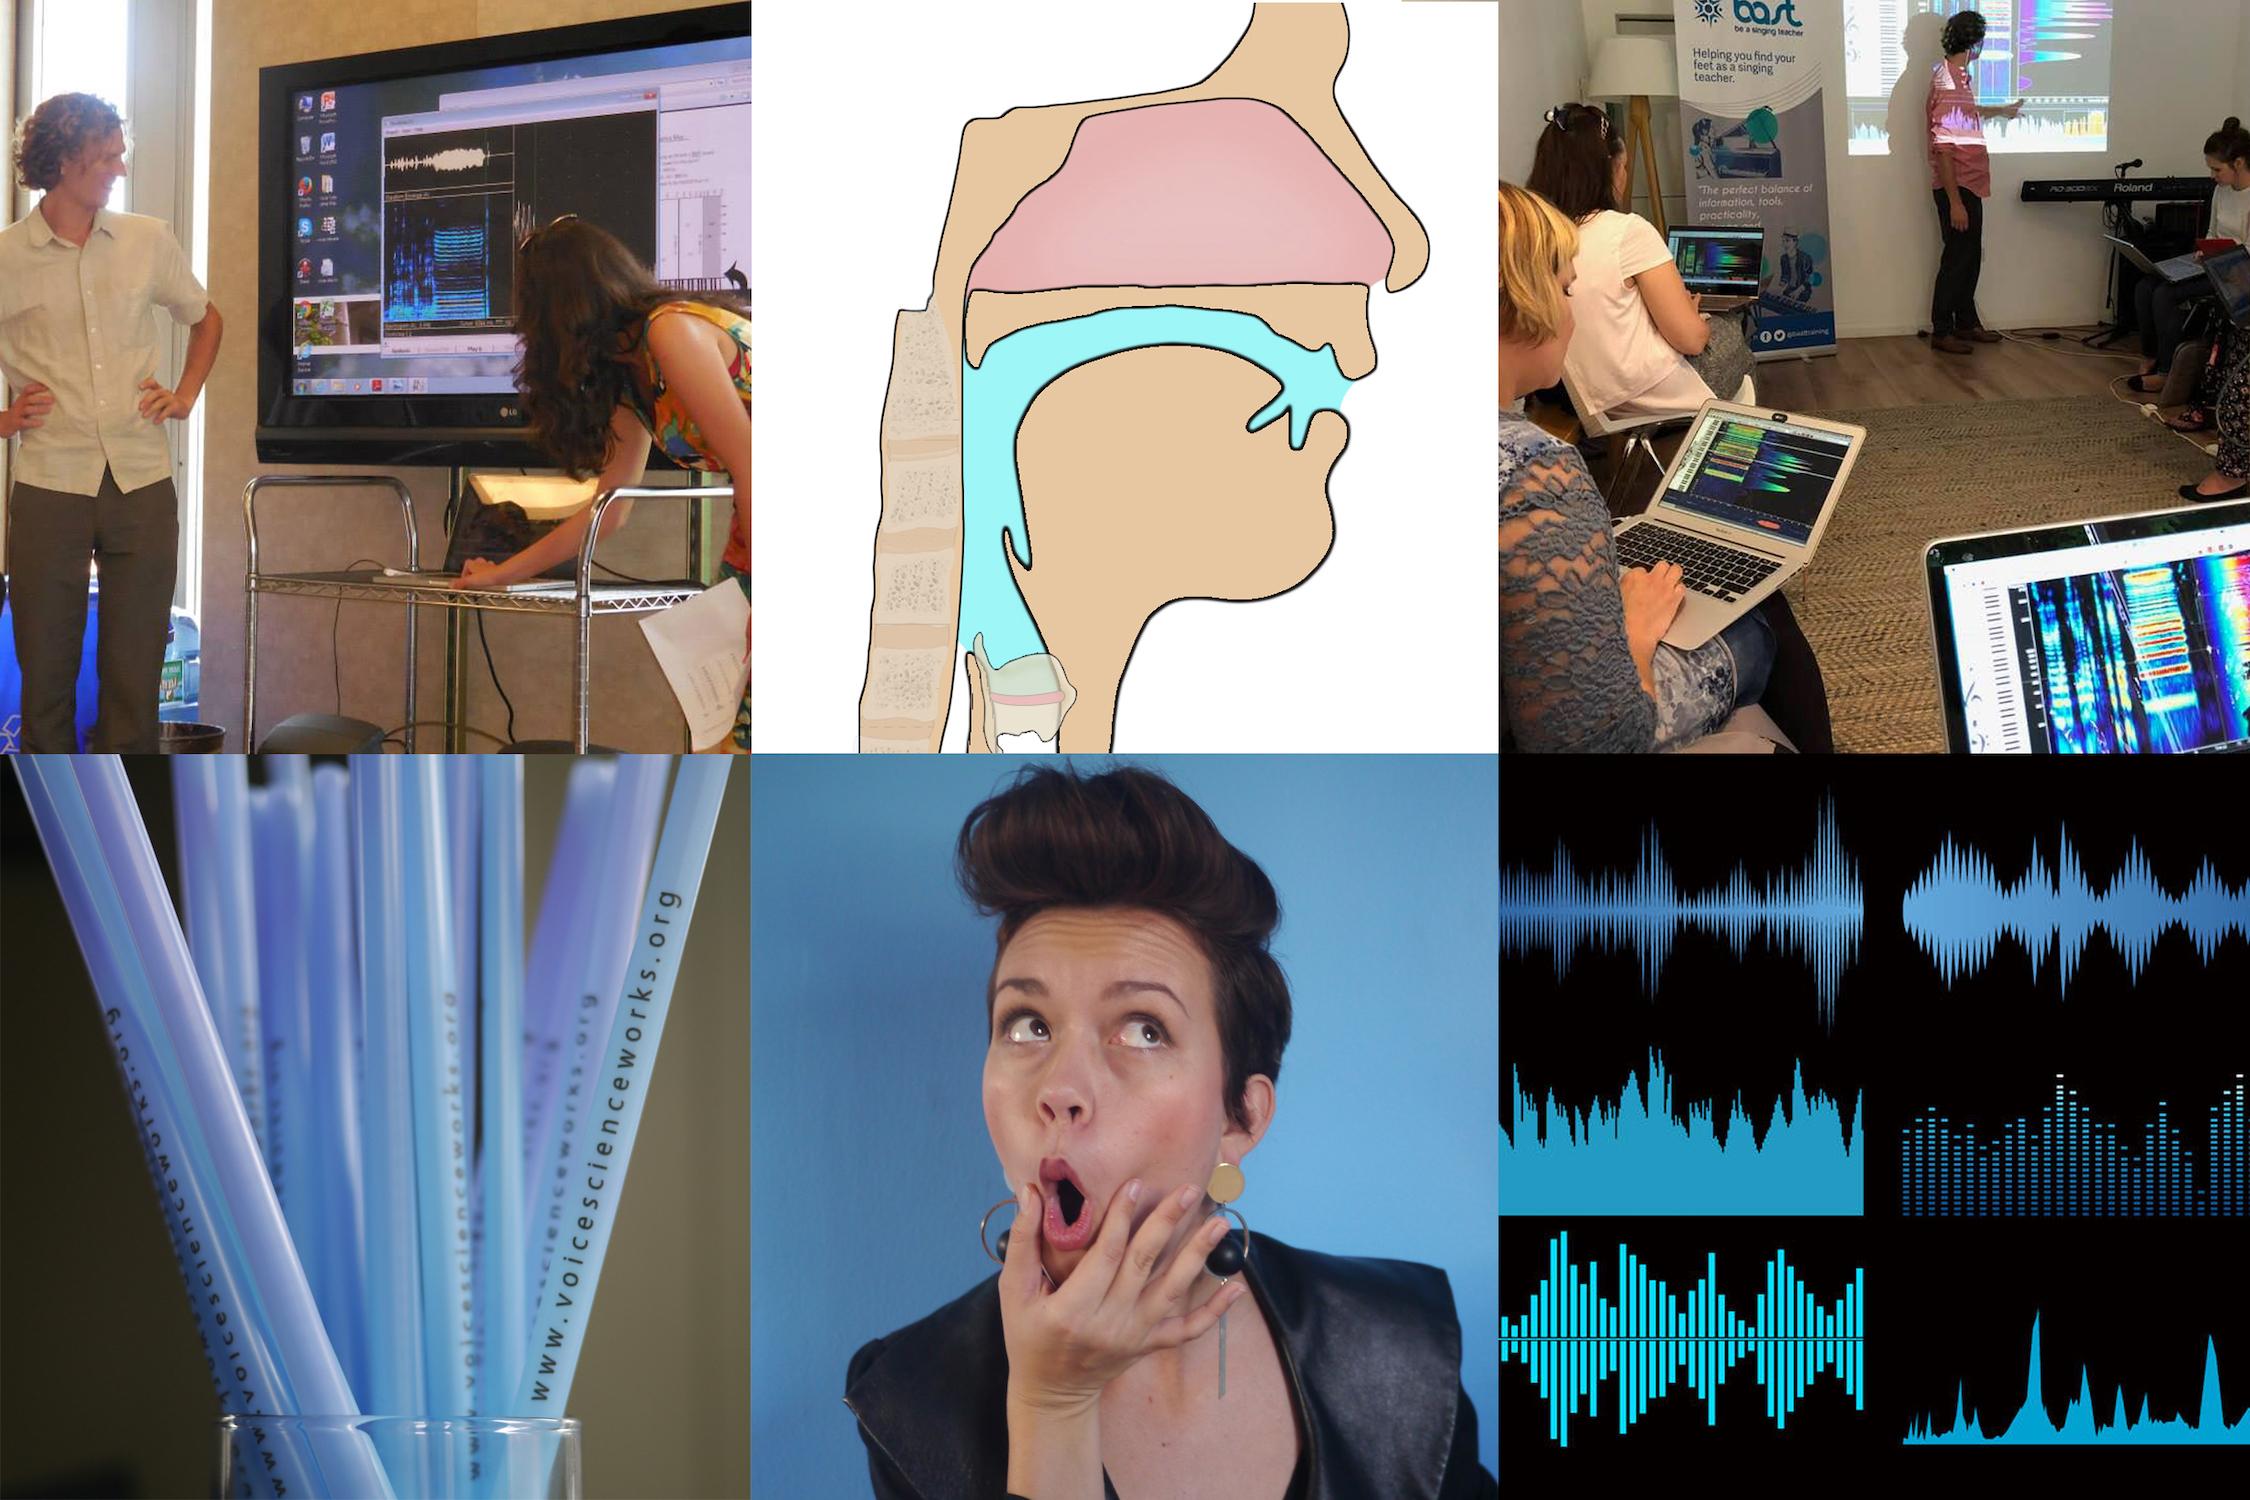 Voicescienceworks